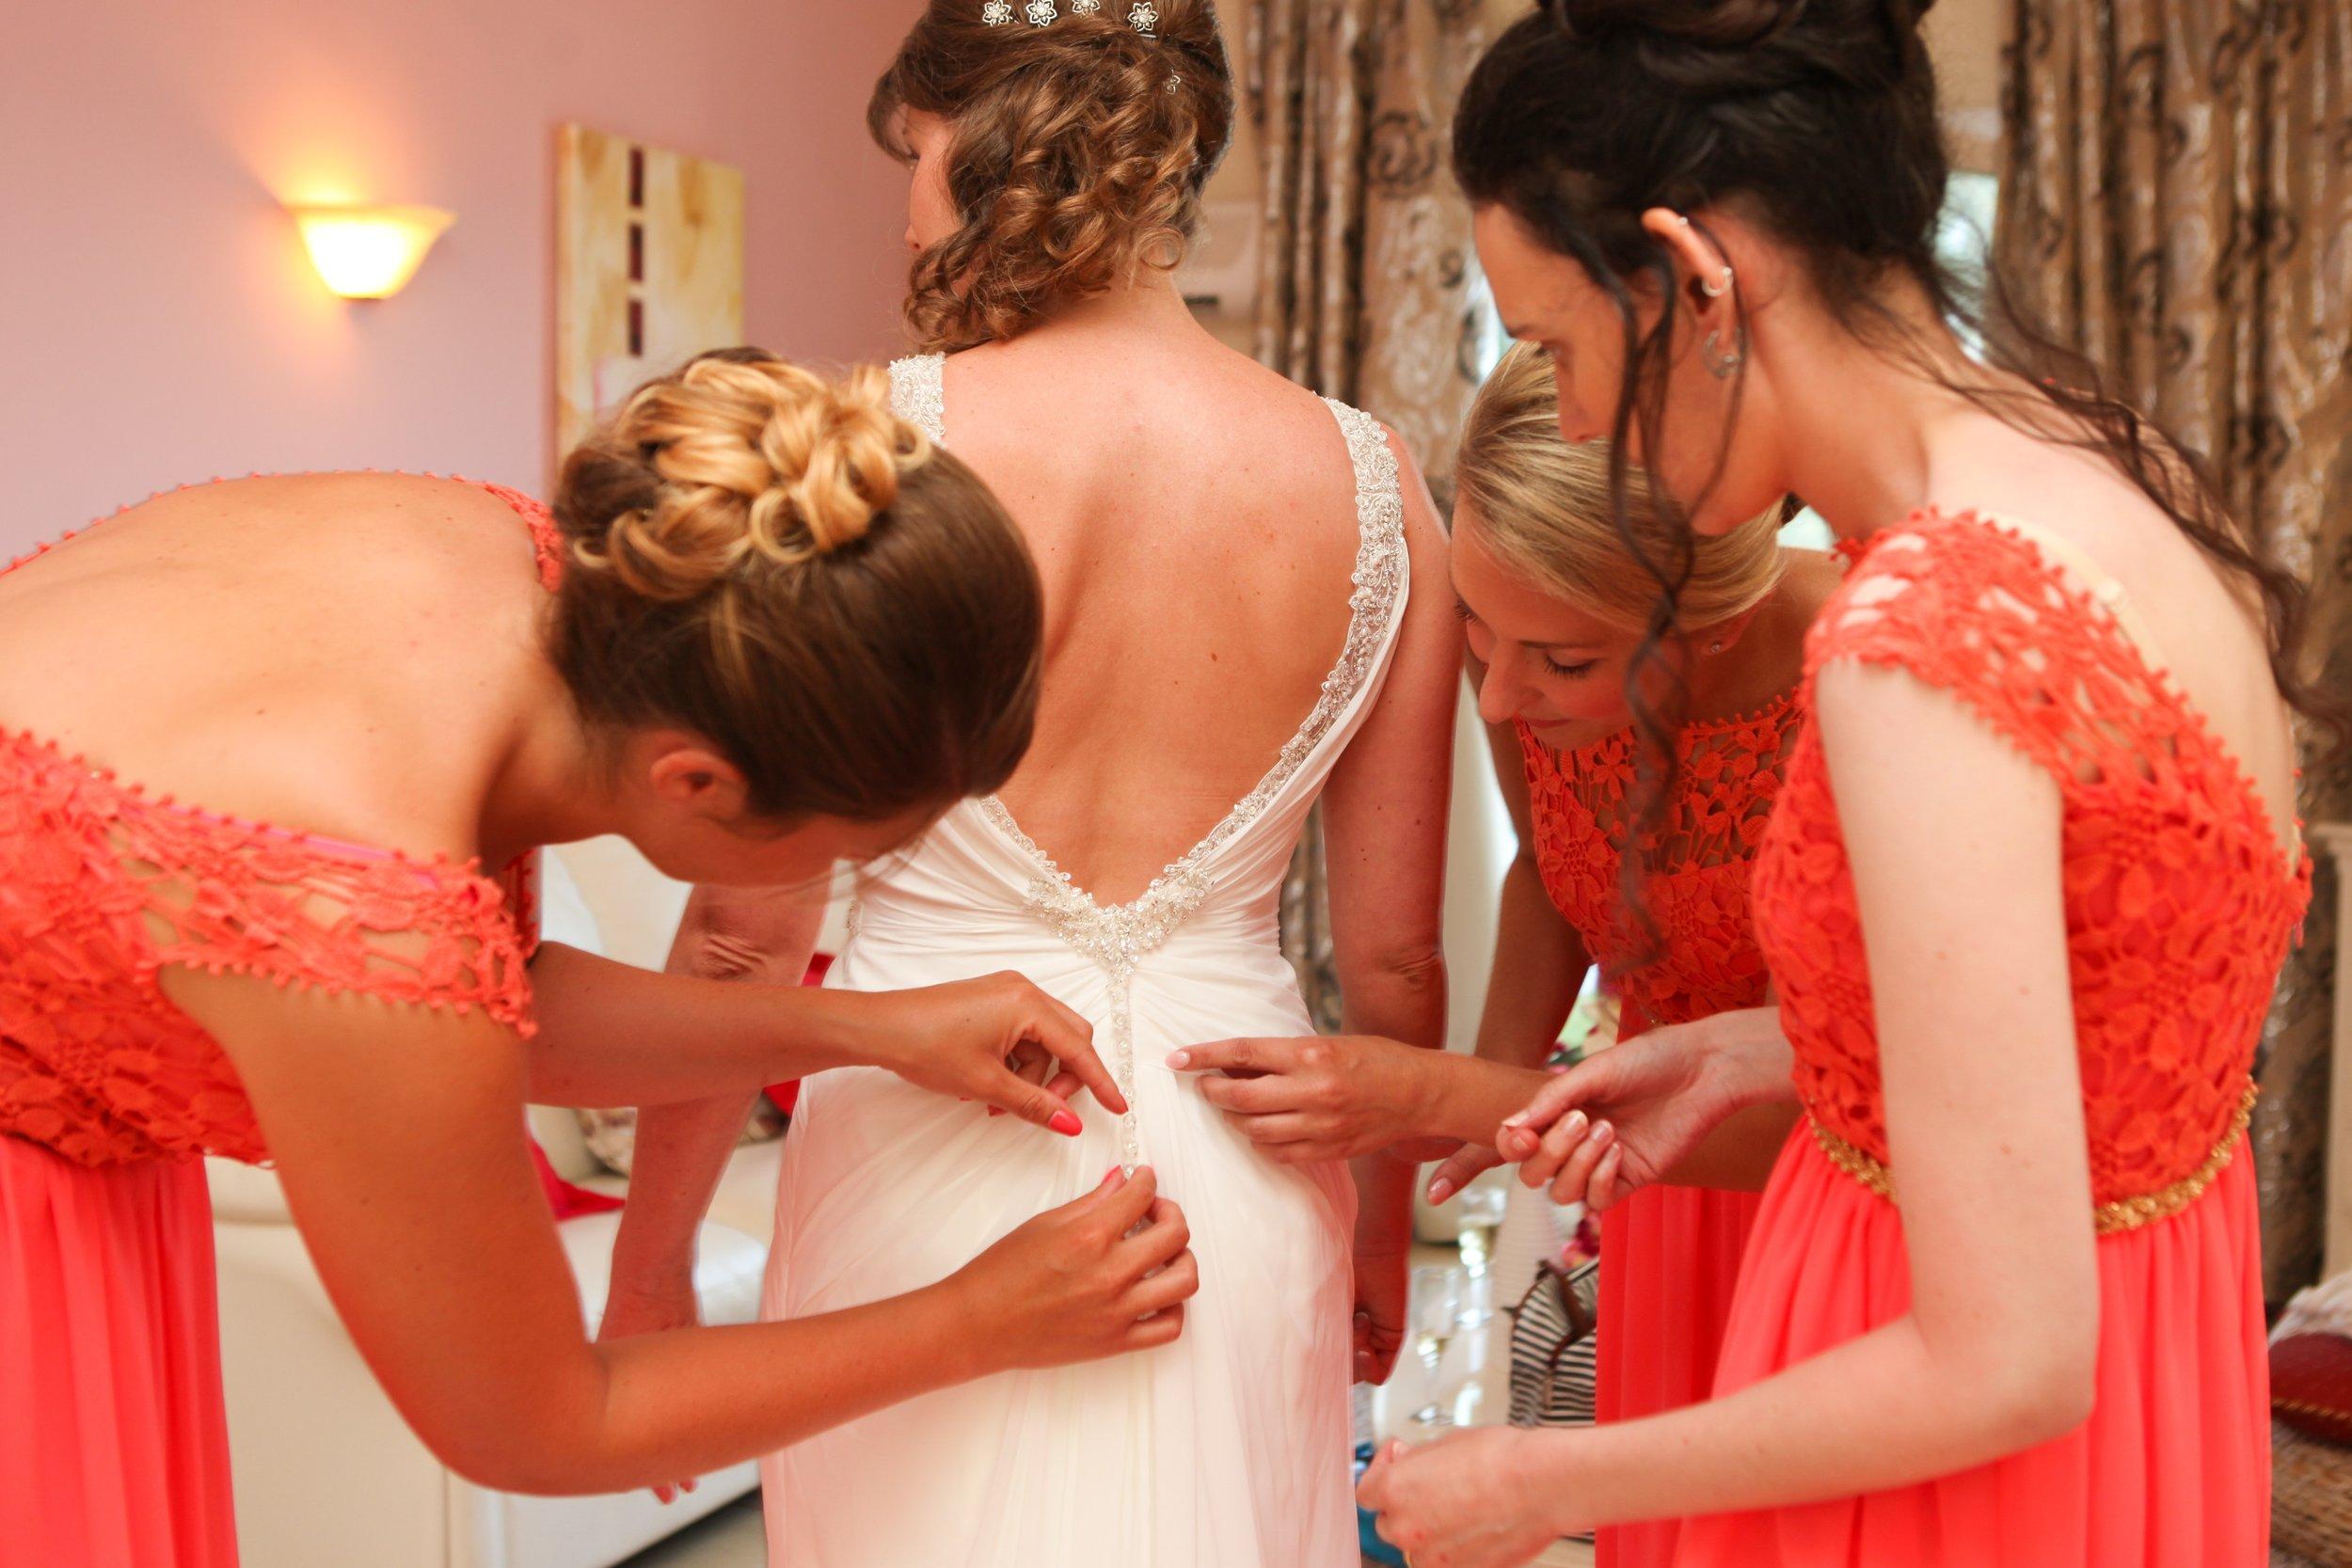 aegean-wedding-photography-429755-unsplash.jpg